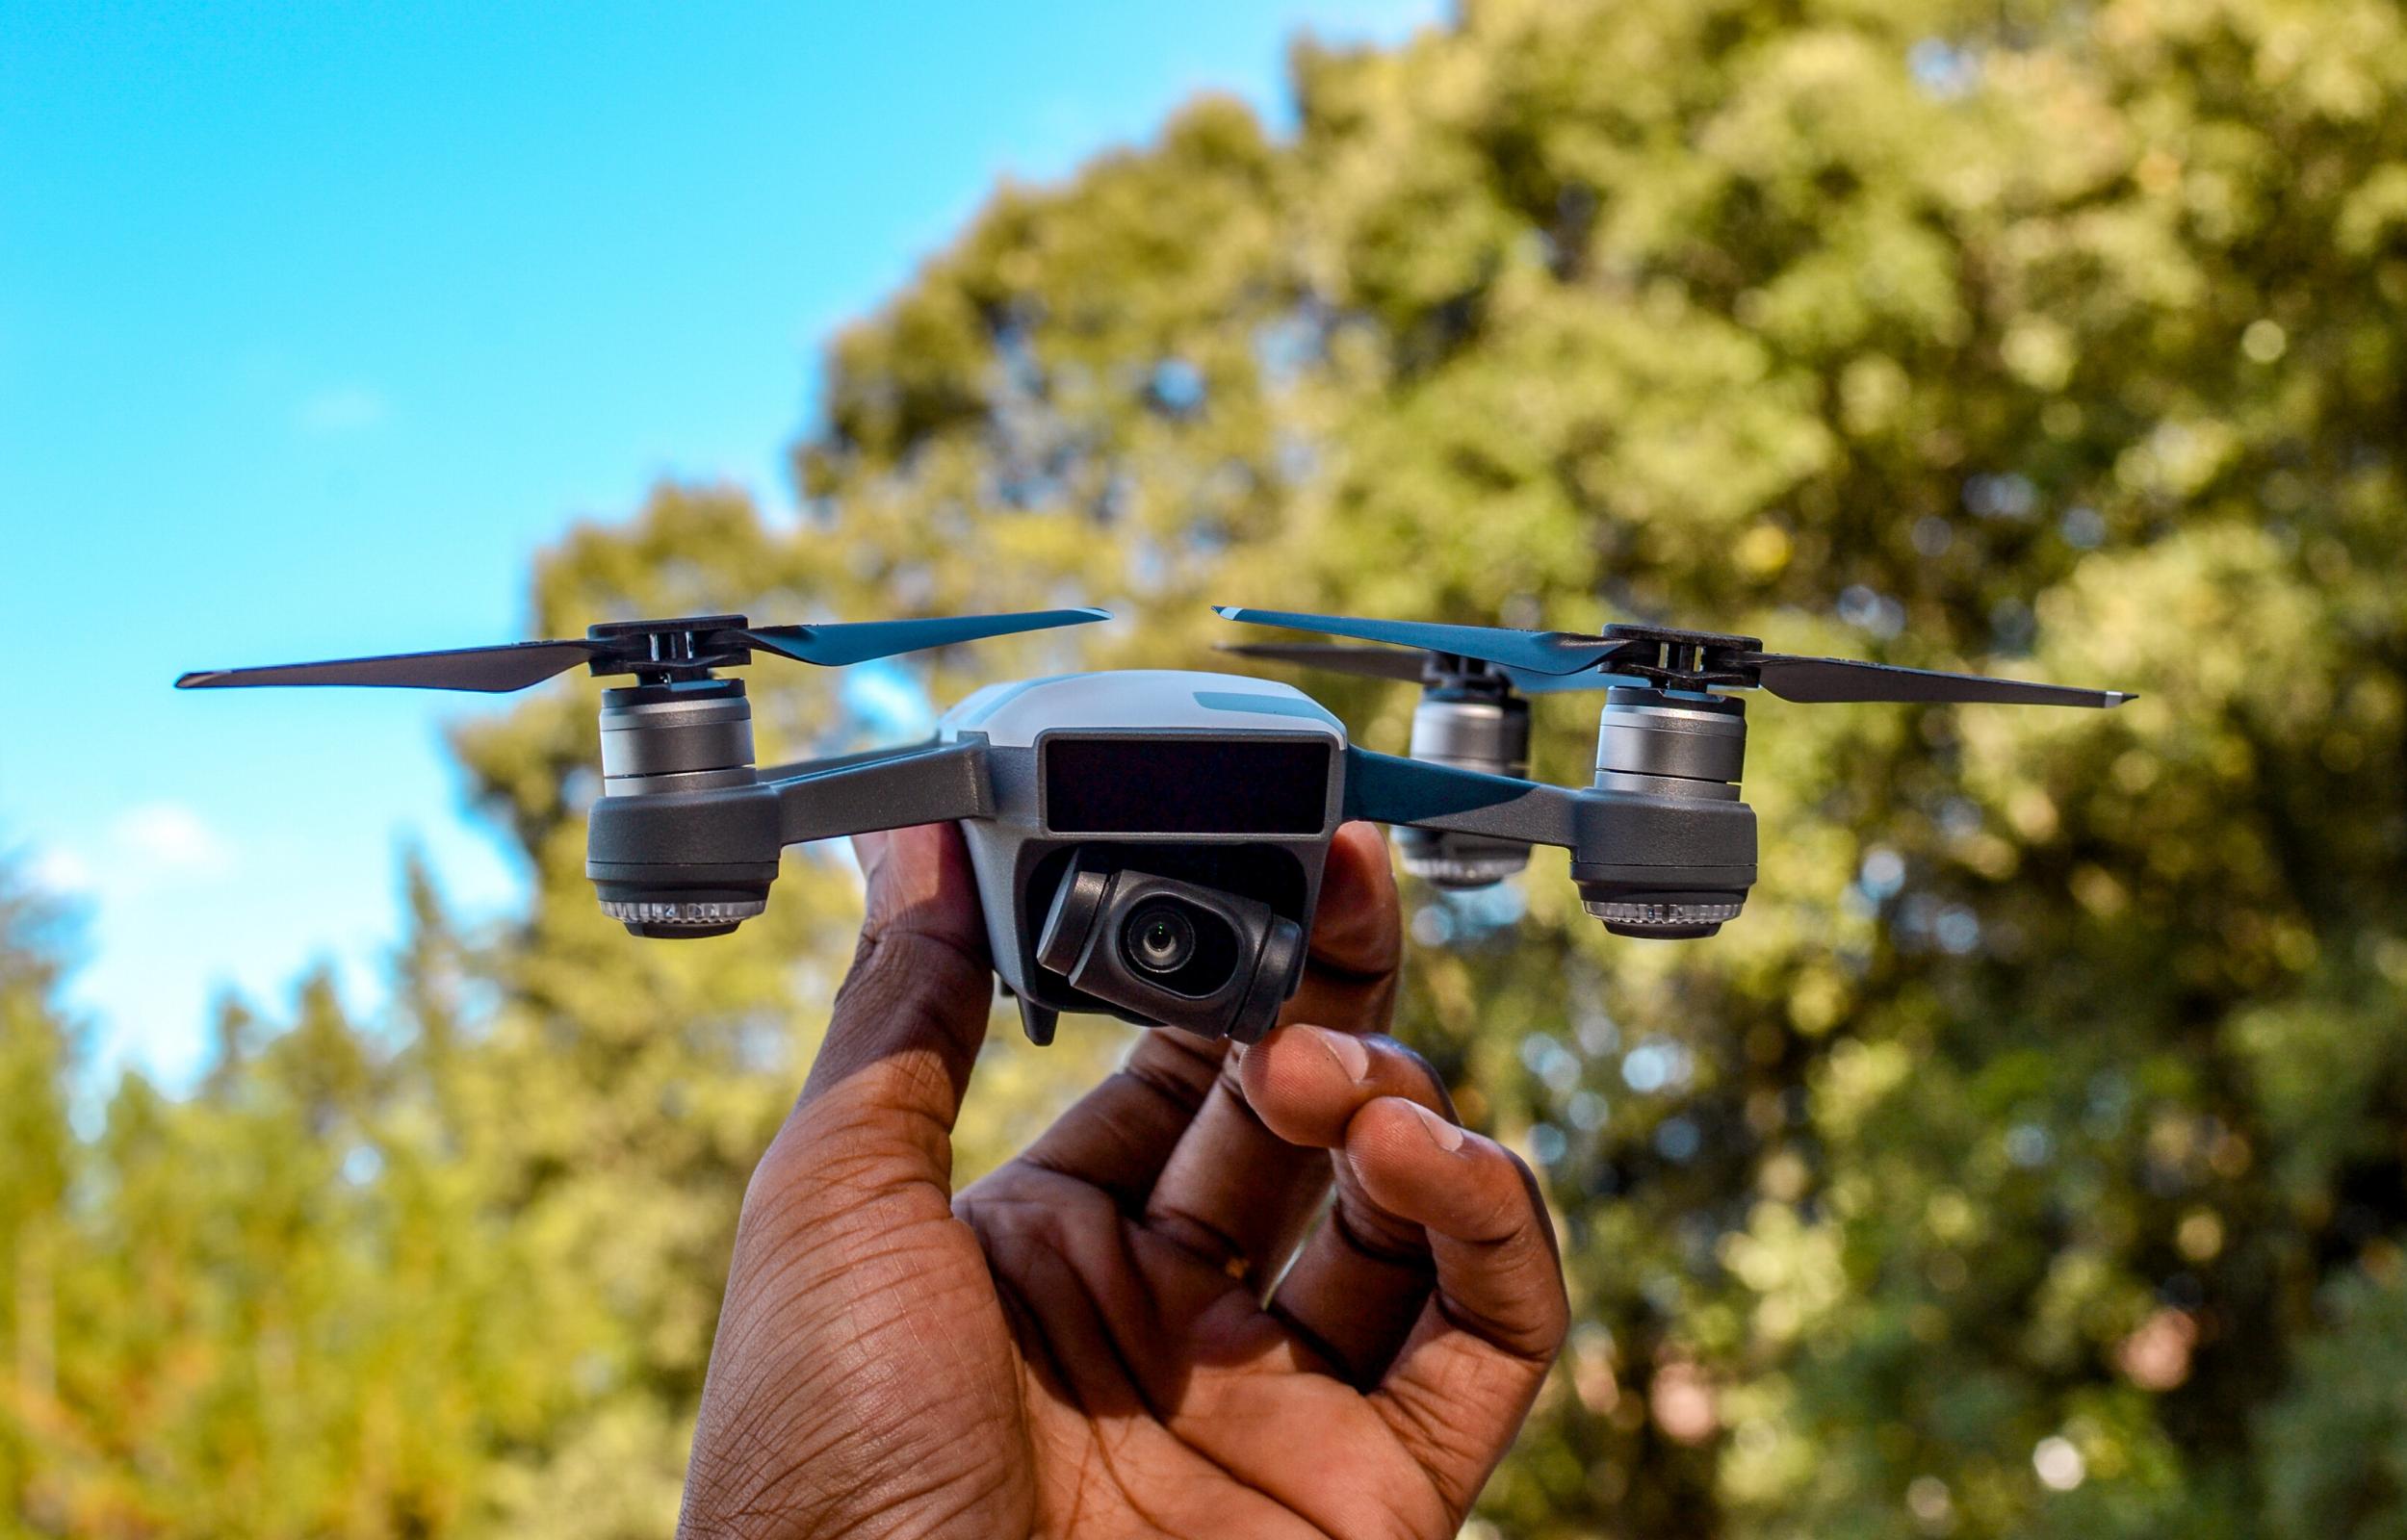 Homme qui tient un drone